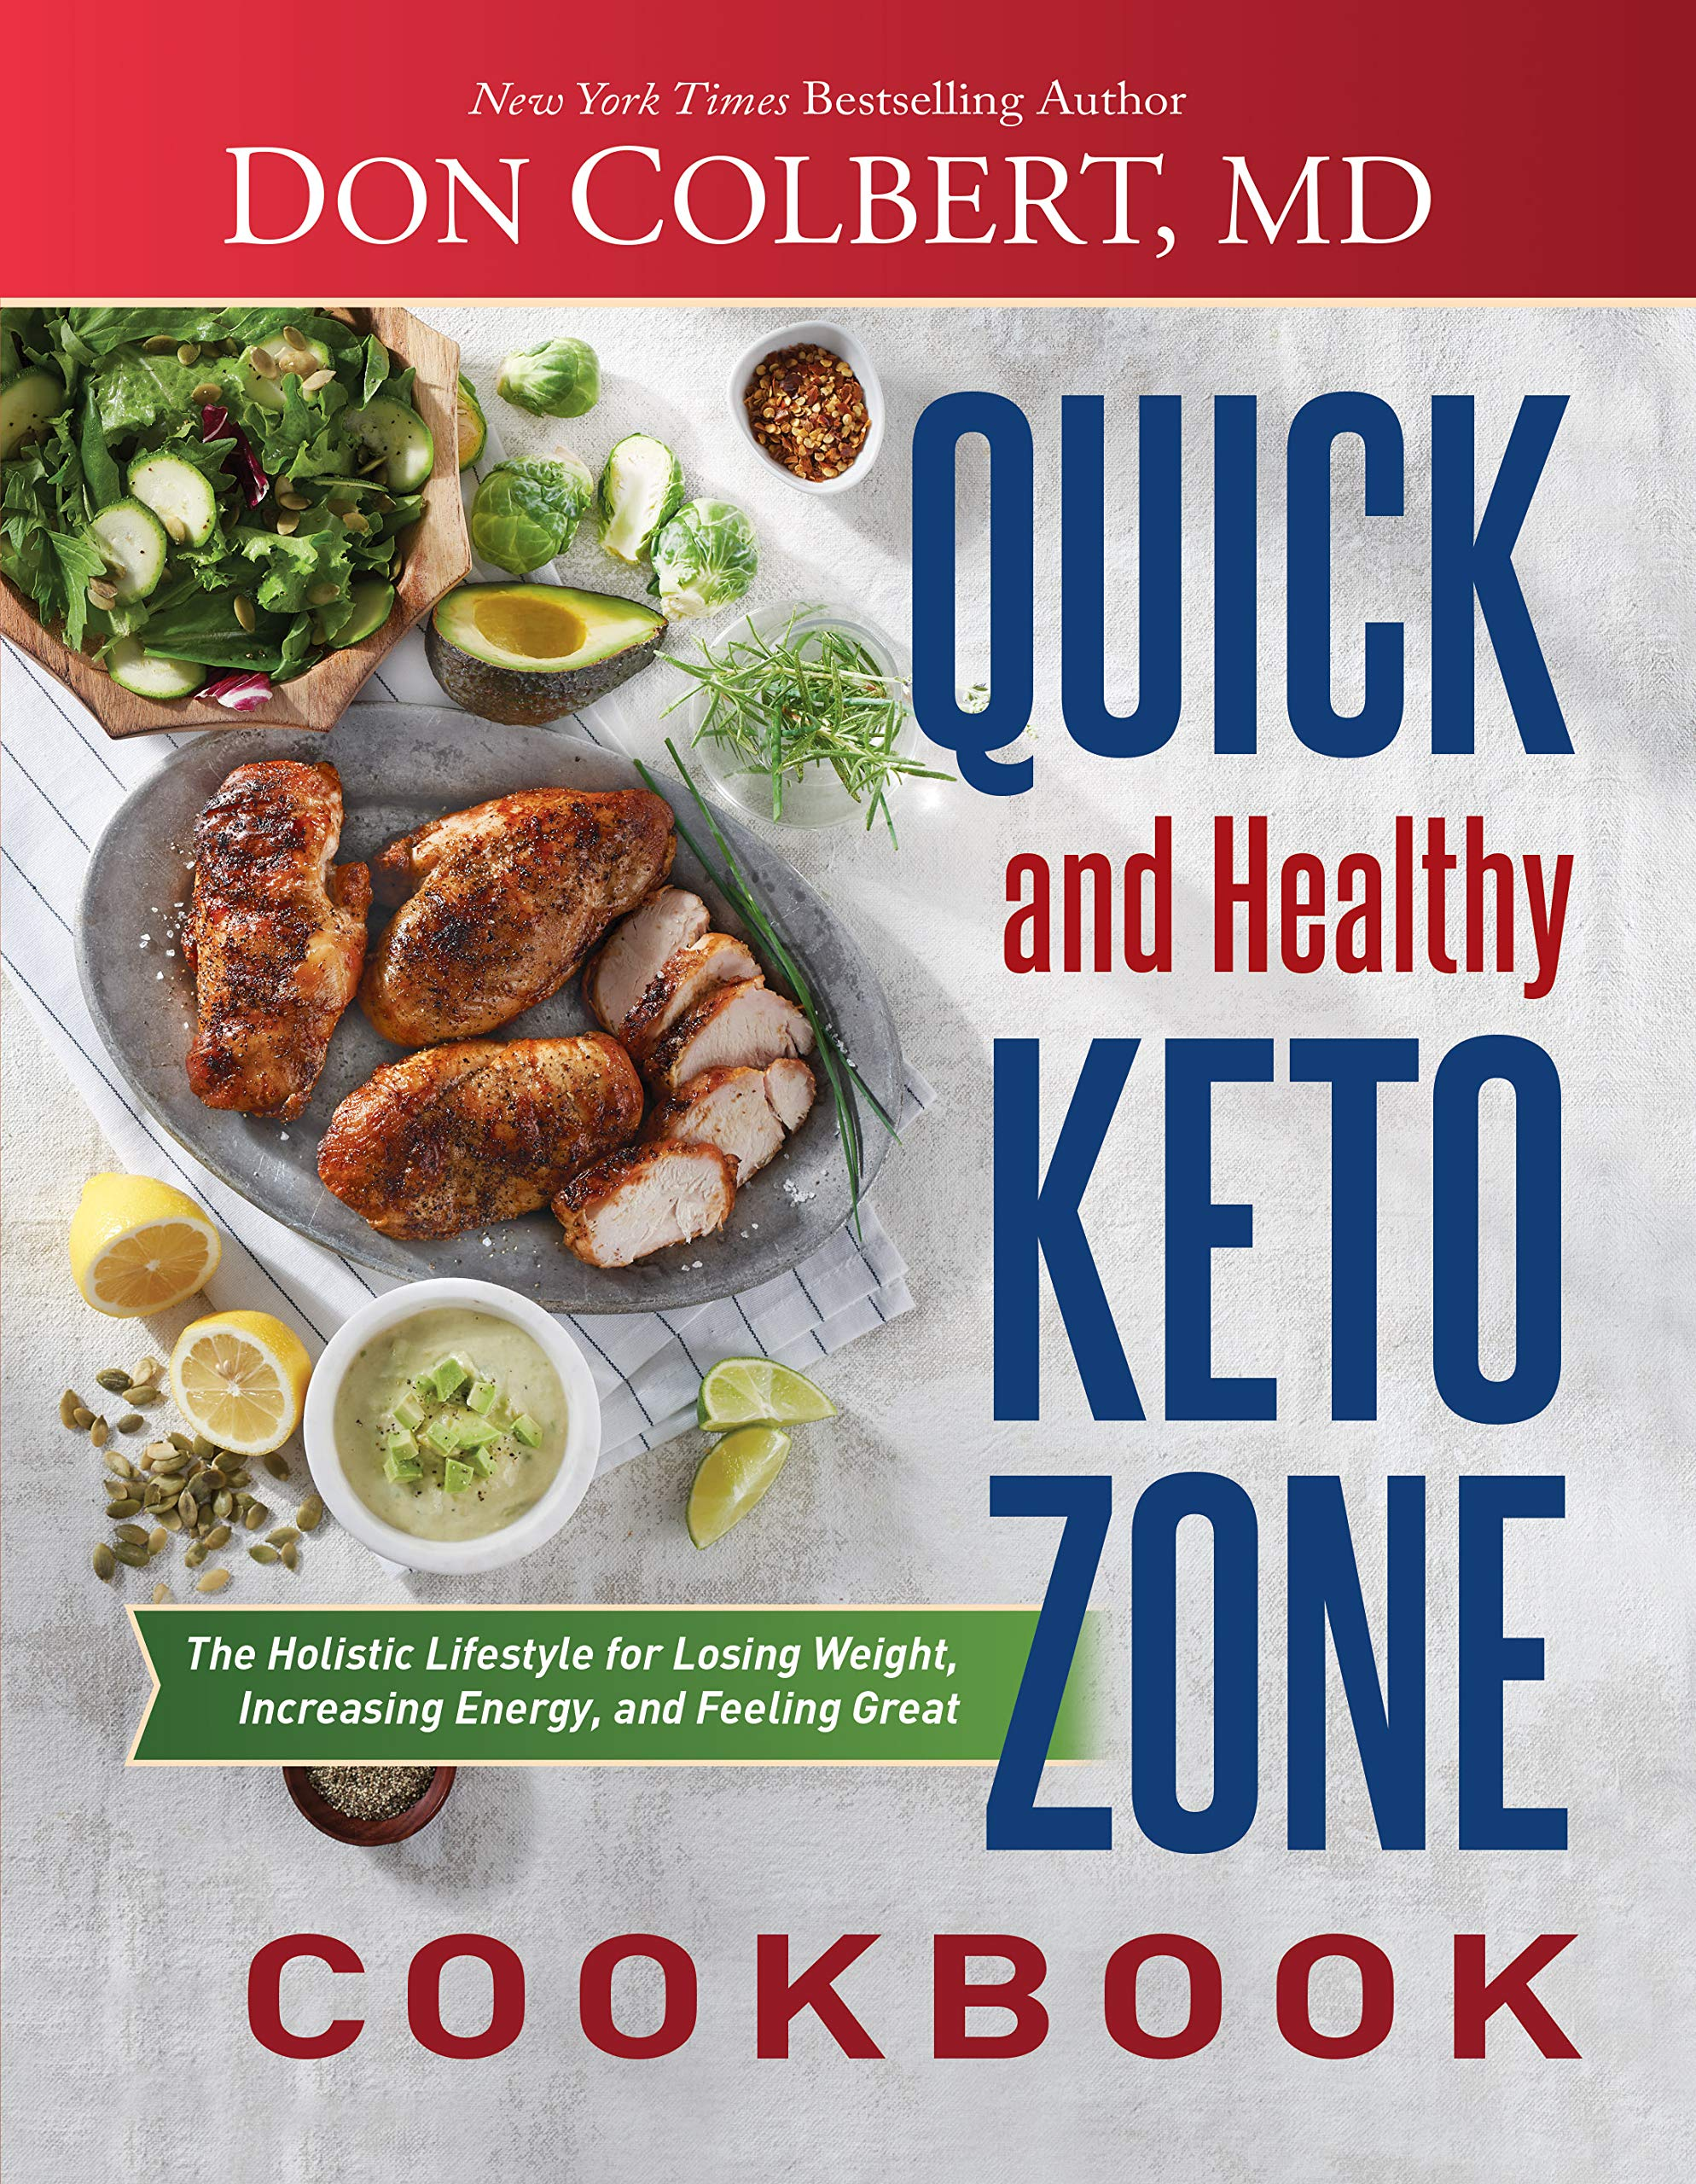 keto diet by dr colbert